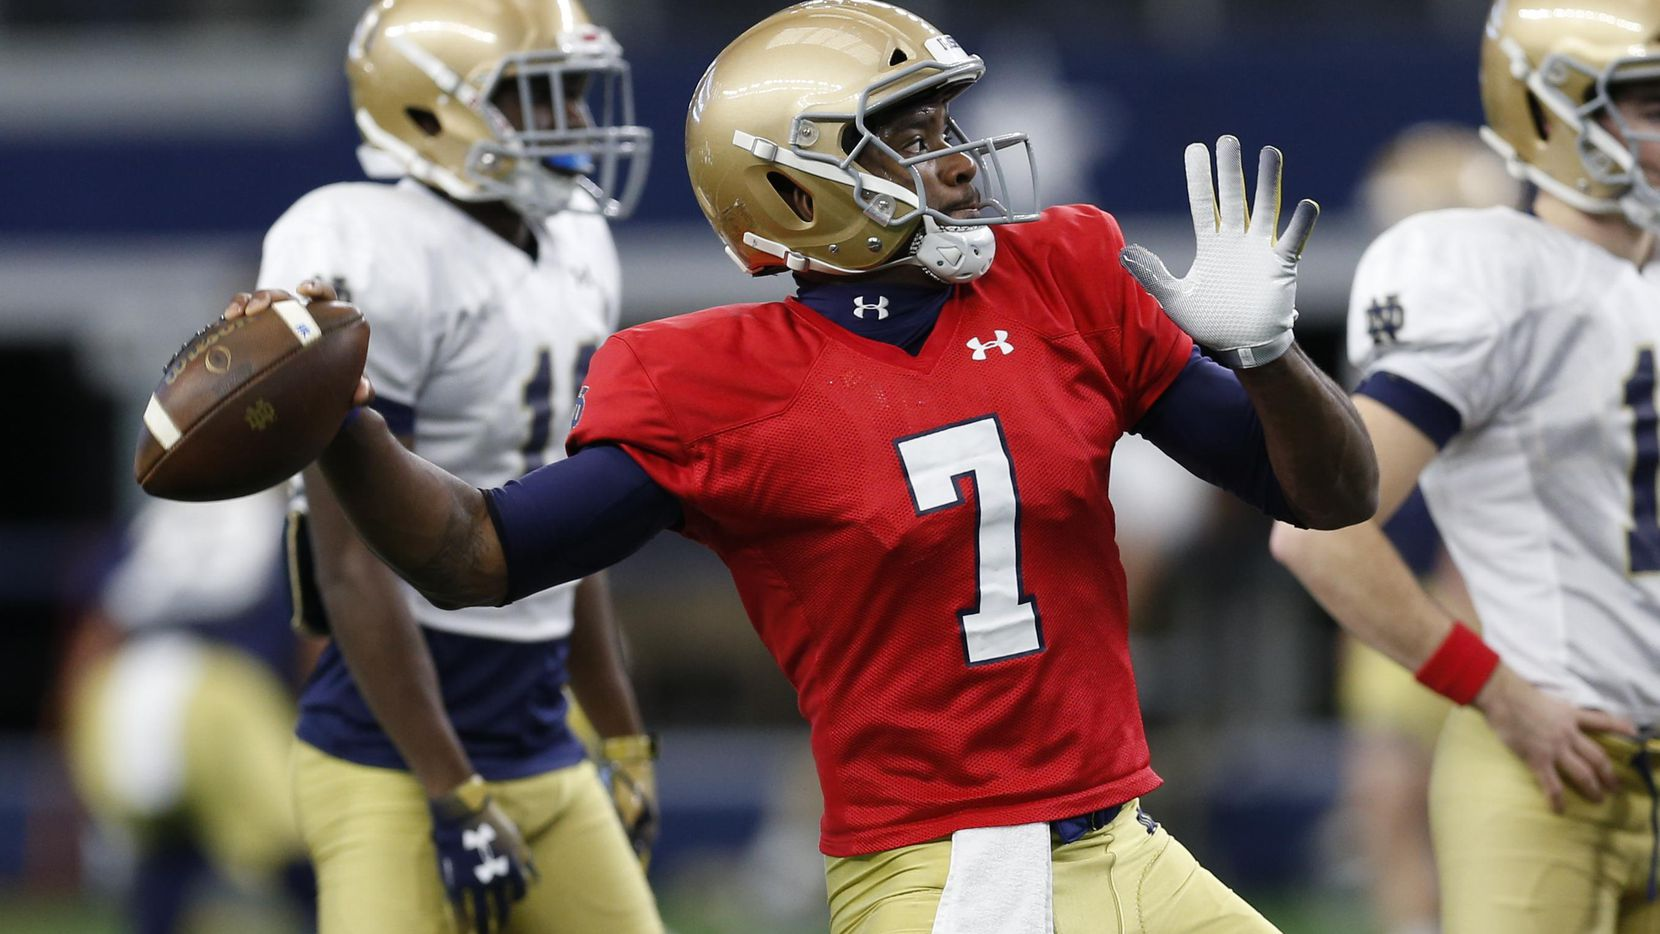 El mariscal del Notre Dame Brandon Wimbush (7) lanza un pase durante una práctica el 24 de diciembre en el AT&T Stadium de Arlington. (AP/Jim Cowsert)